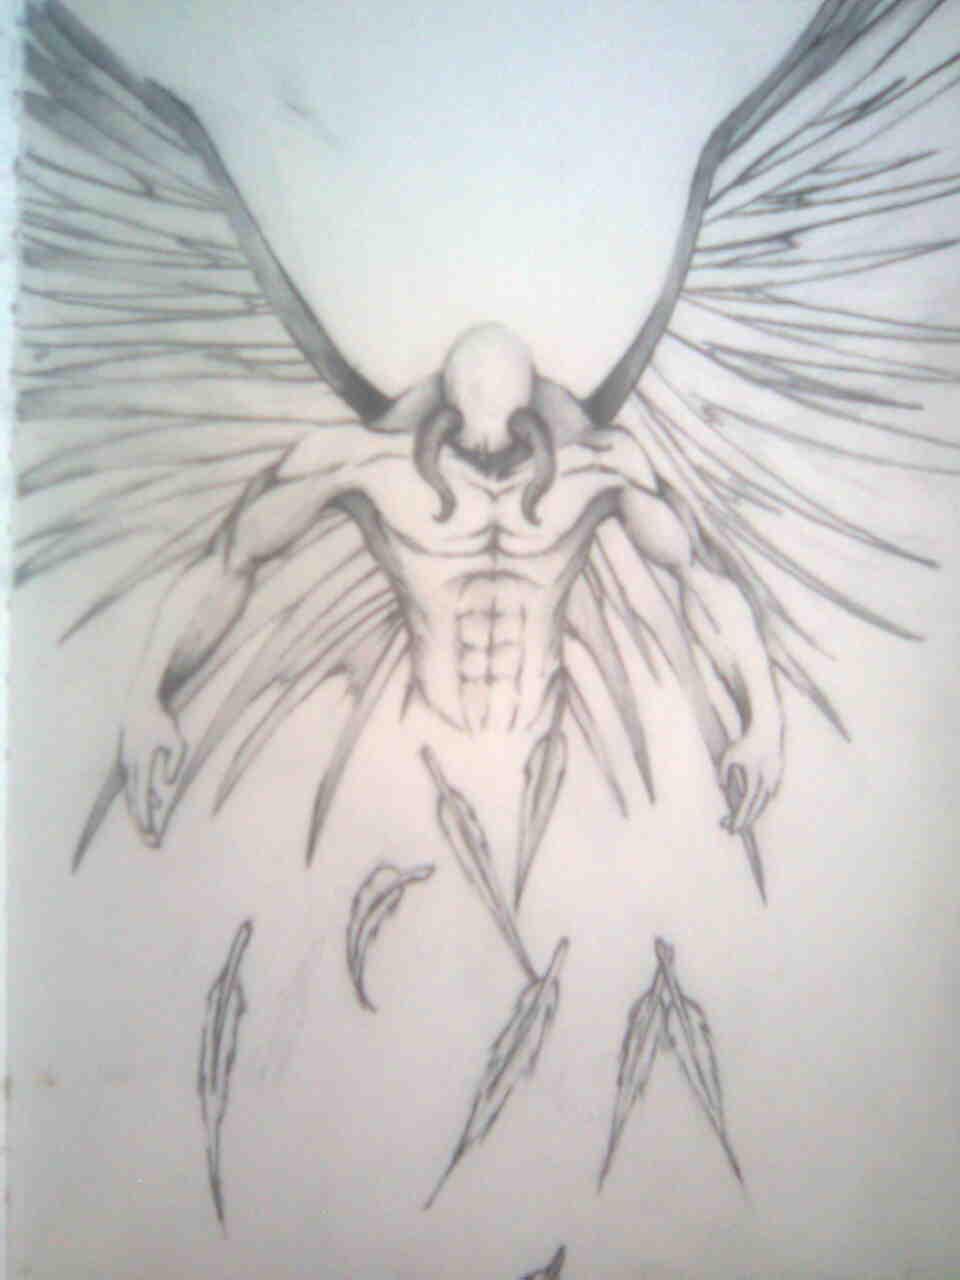 fallen angel tattoo drawing design idea | Drawing ...